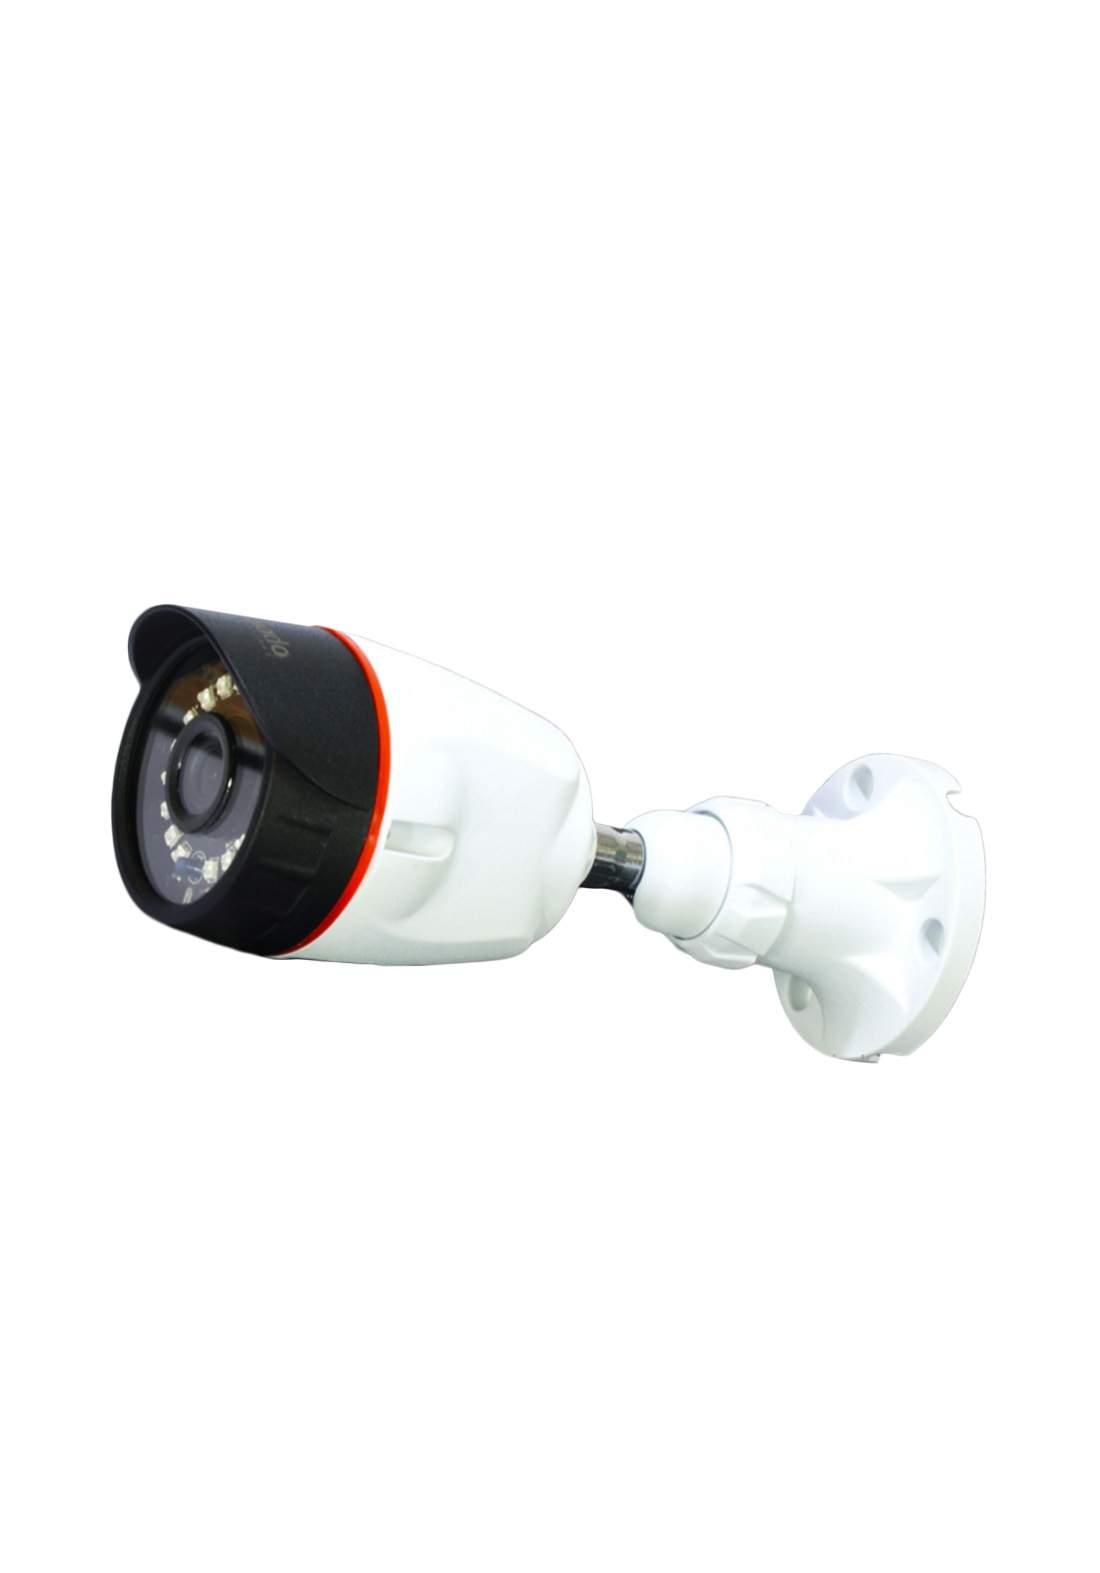 Tornado A-64 AHD Security Camera 2mp - White كاميرا مراقبة